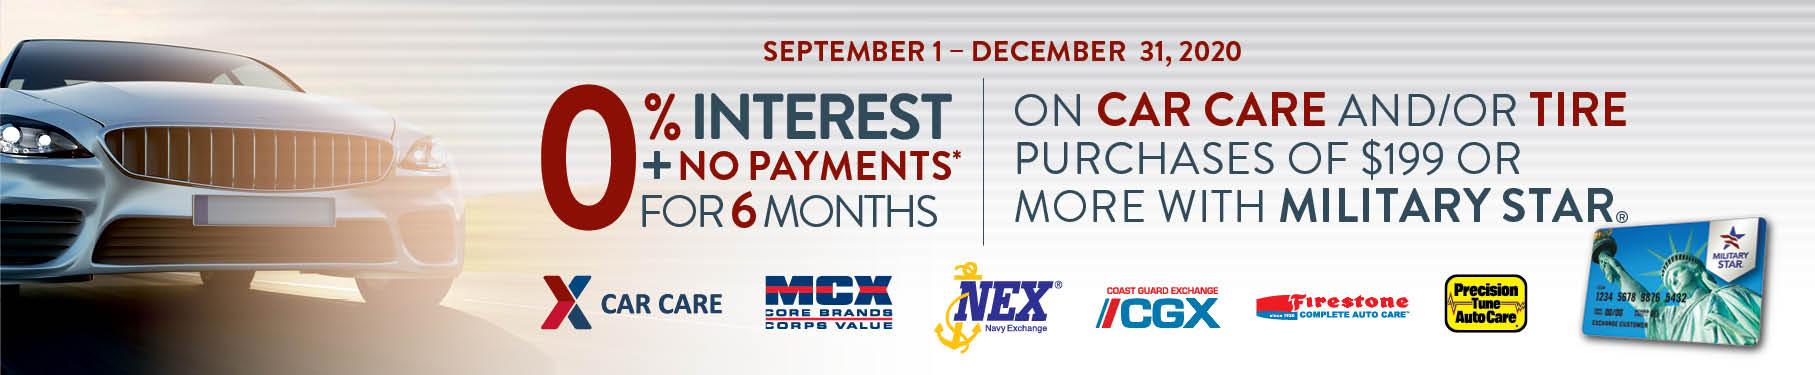 Myecp Customerads Exchange